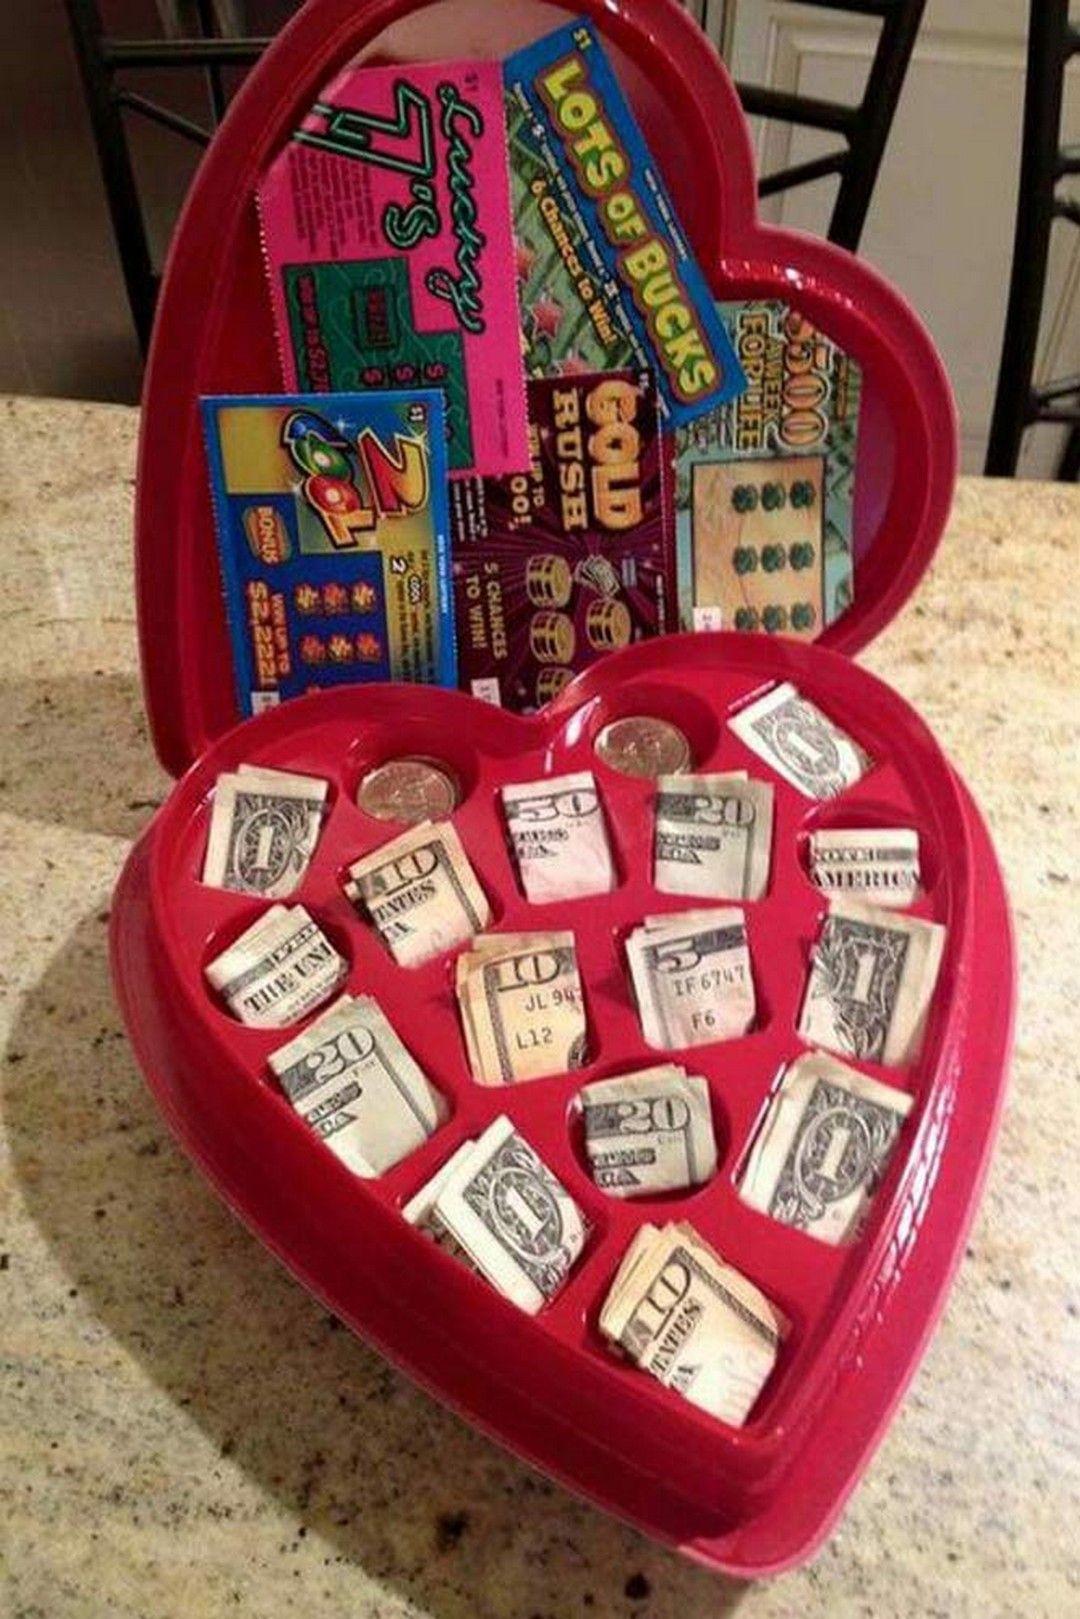 Diy Valentines Day Gifts For Your Boyfriend Or Friend Https Www